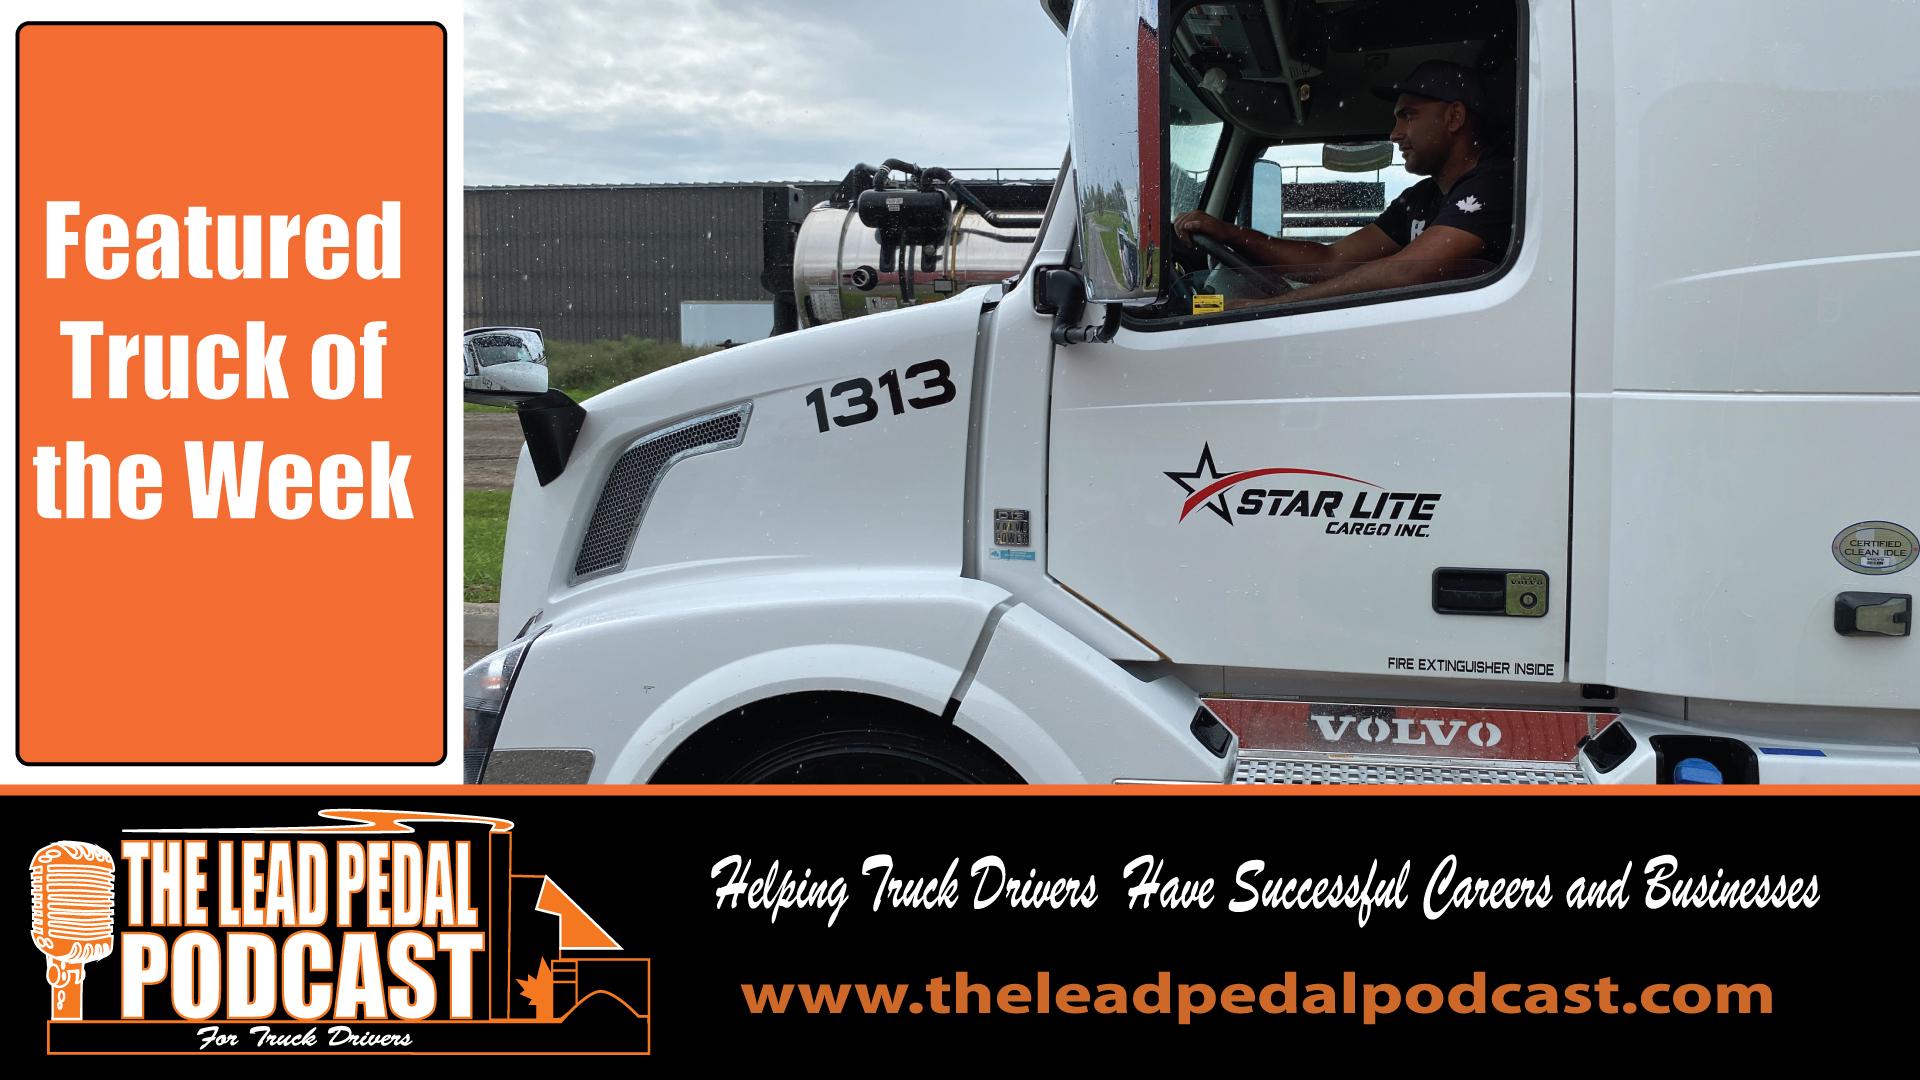 LP688 Featured Truck of the Week - Starlite Cargo